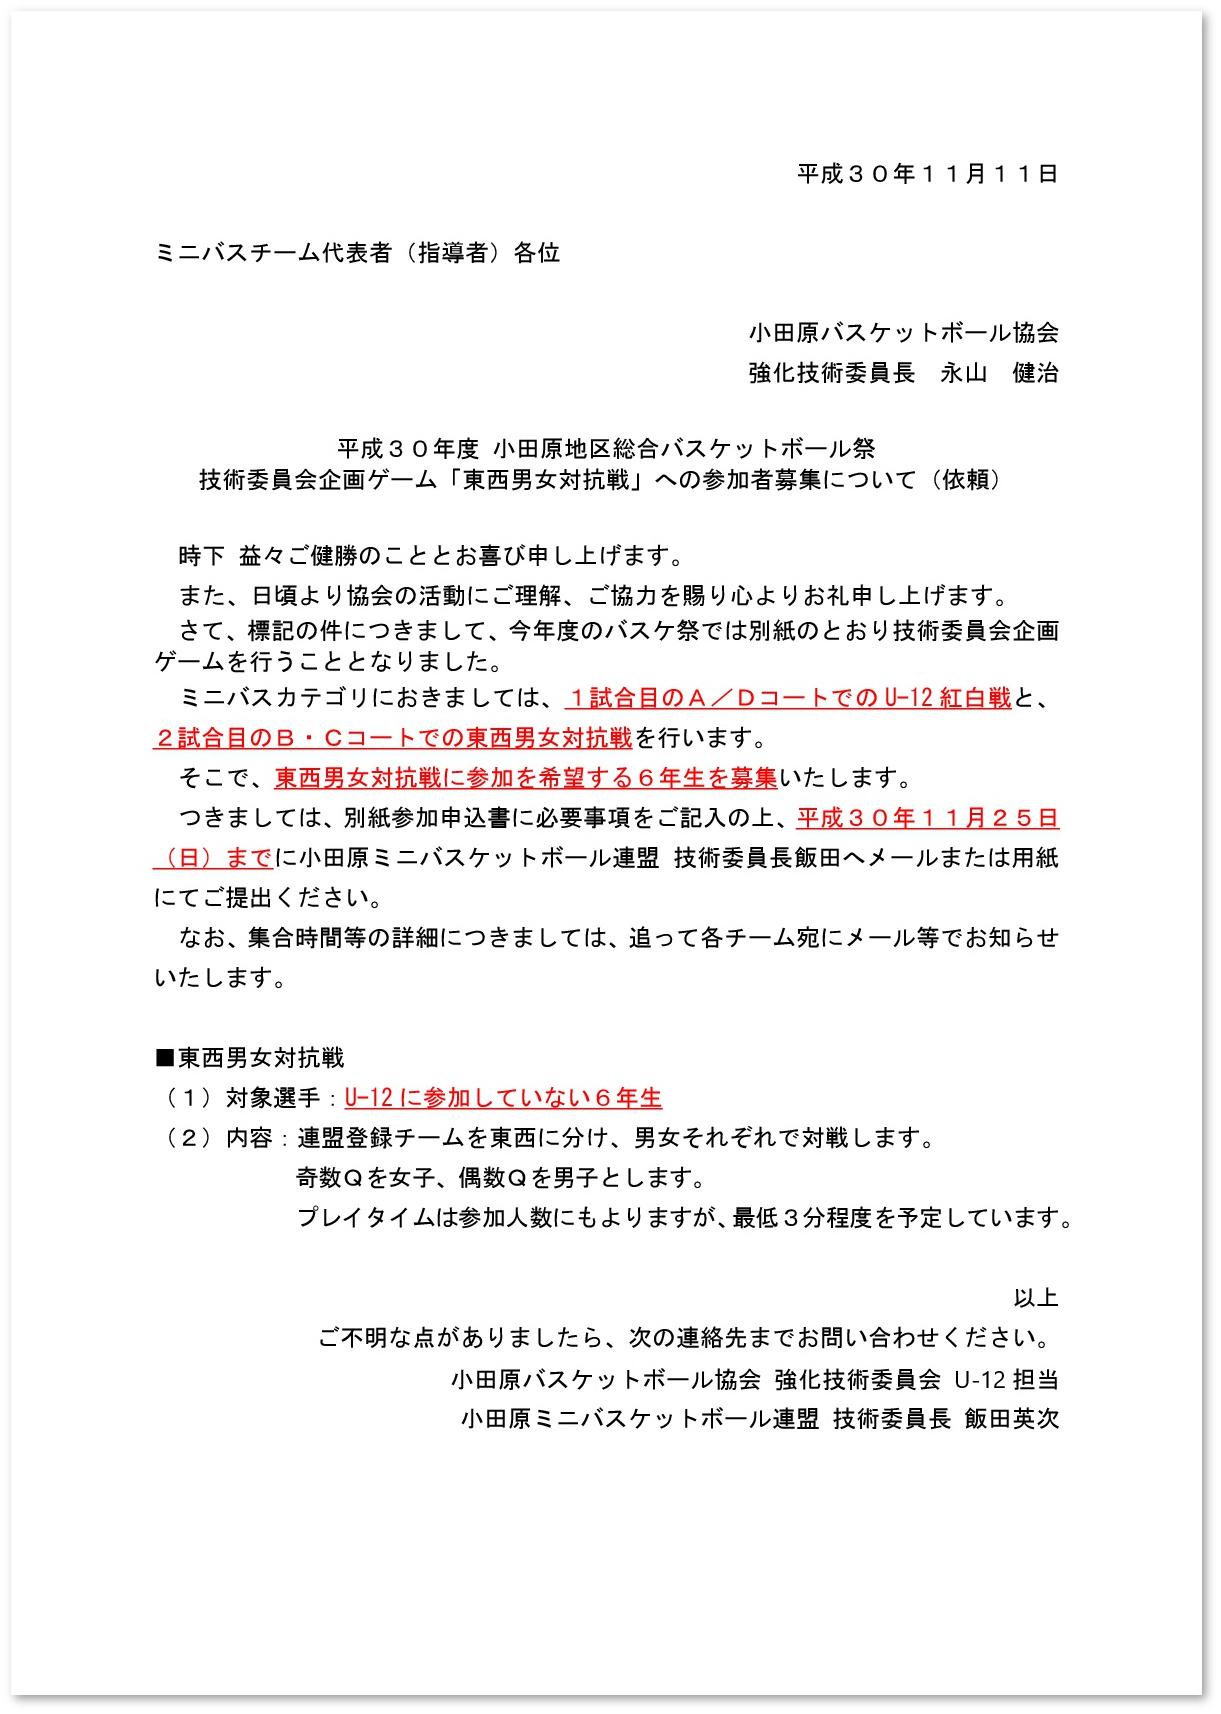 2018年バスケ祭技術委員会企画東西男女ゲーム案内